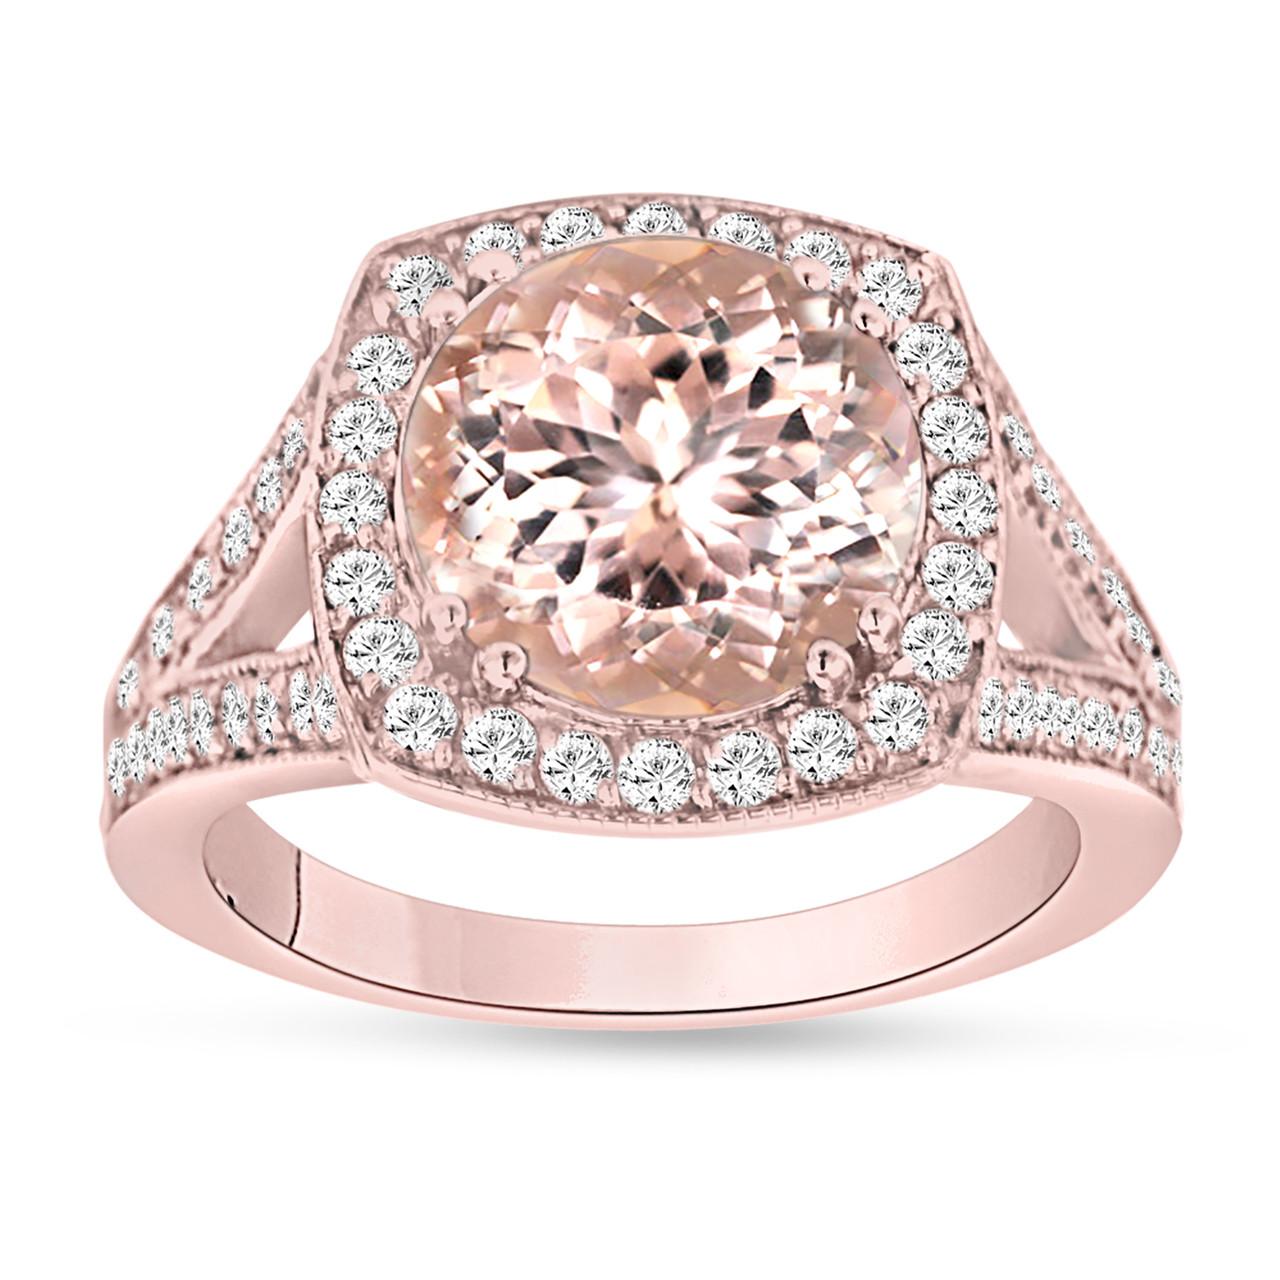 Blue Diamond Engagement Rings | Vintage Black Gold Rings ...